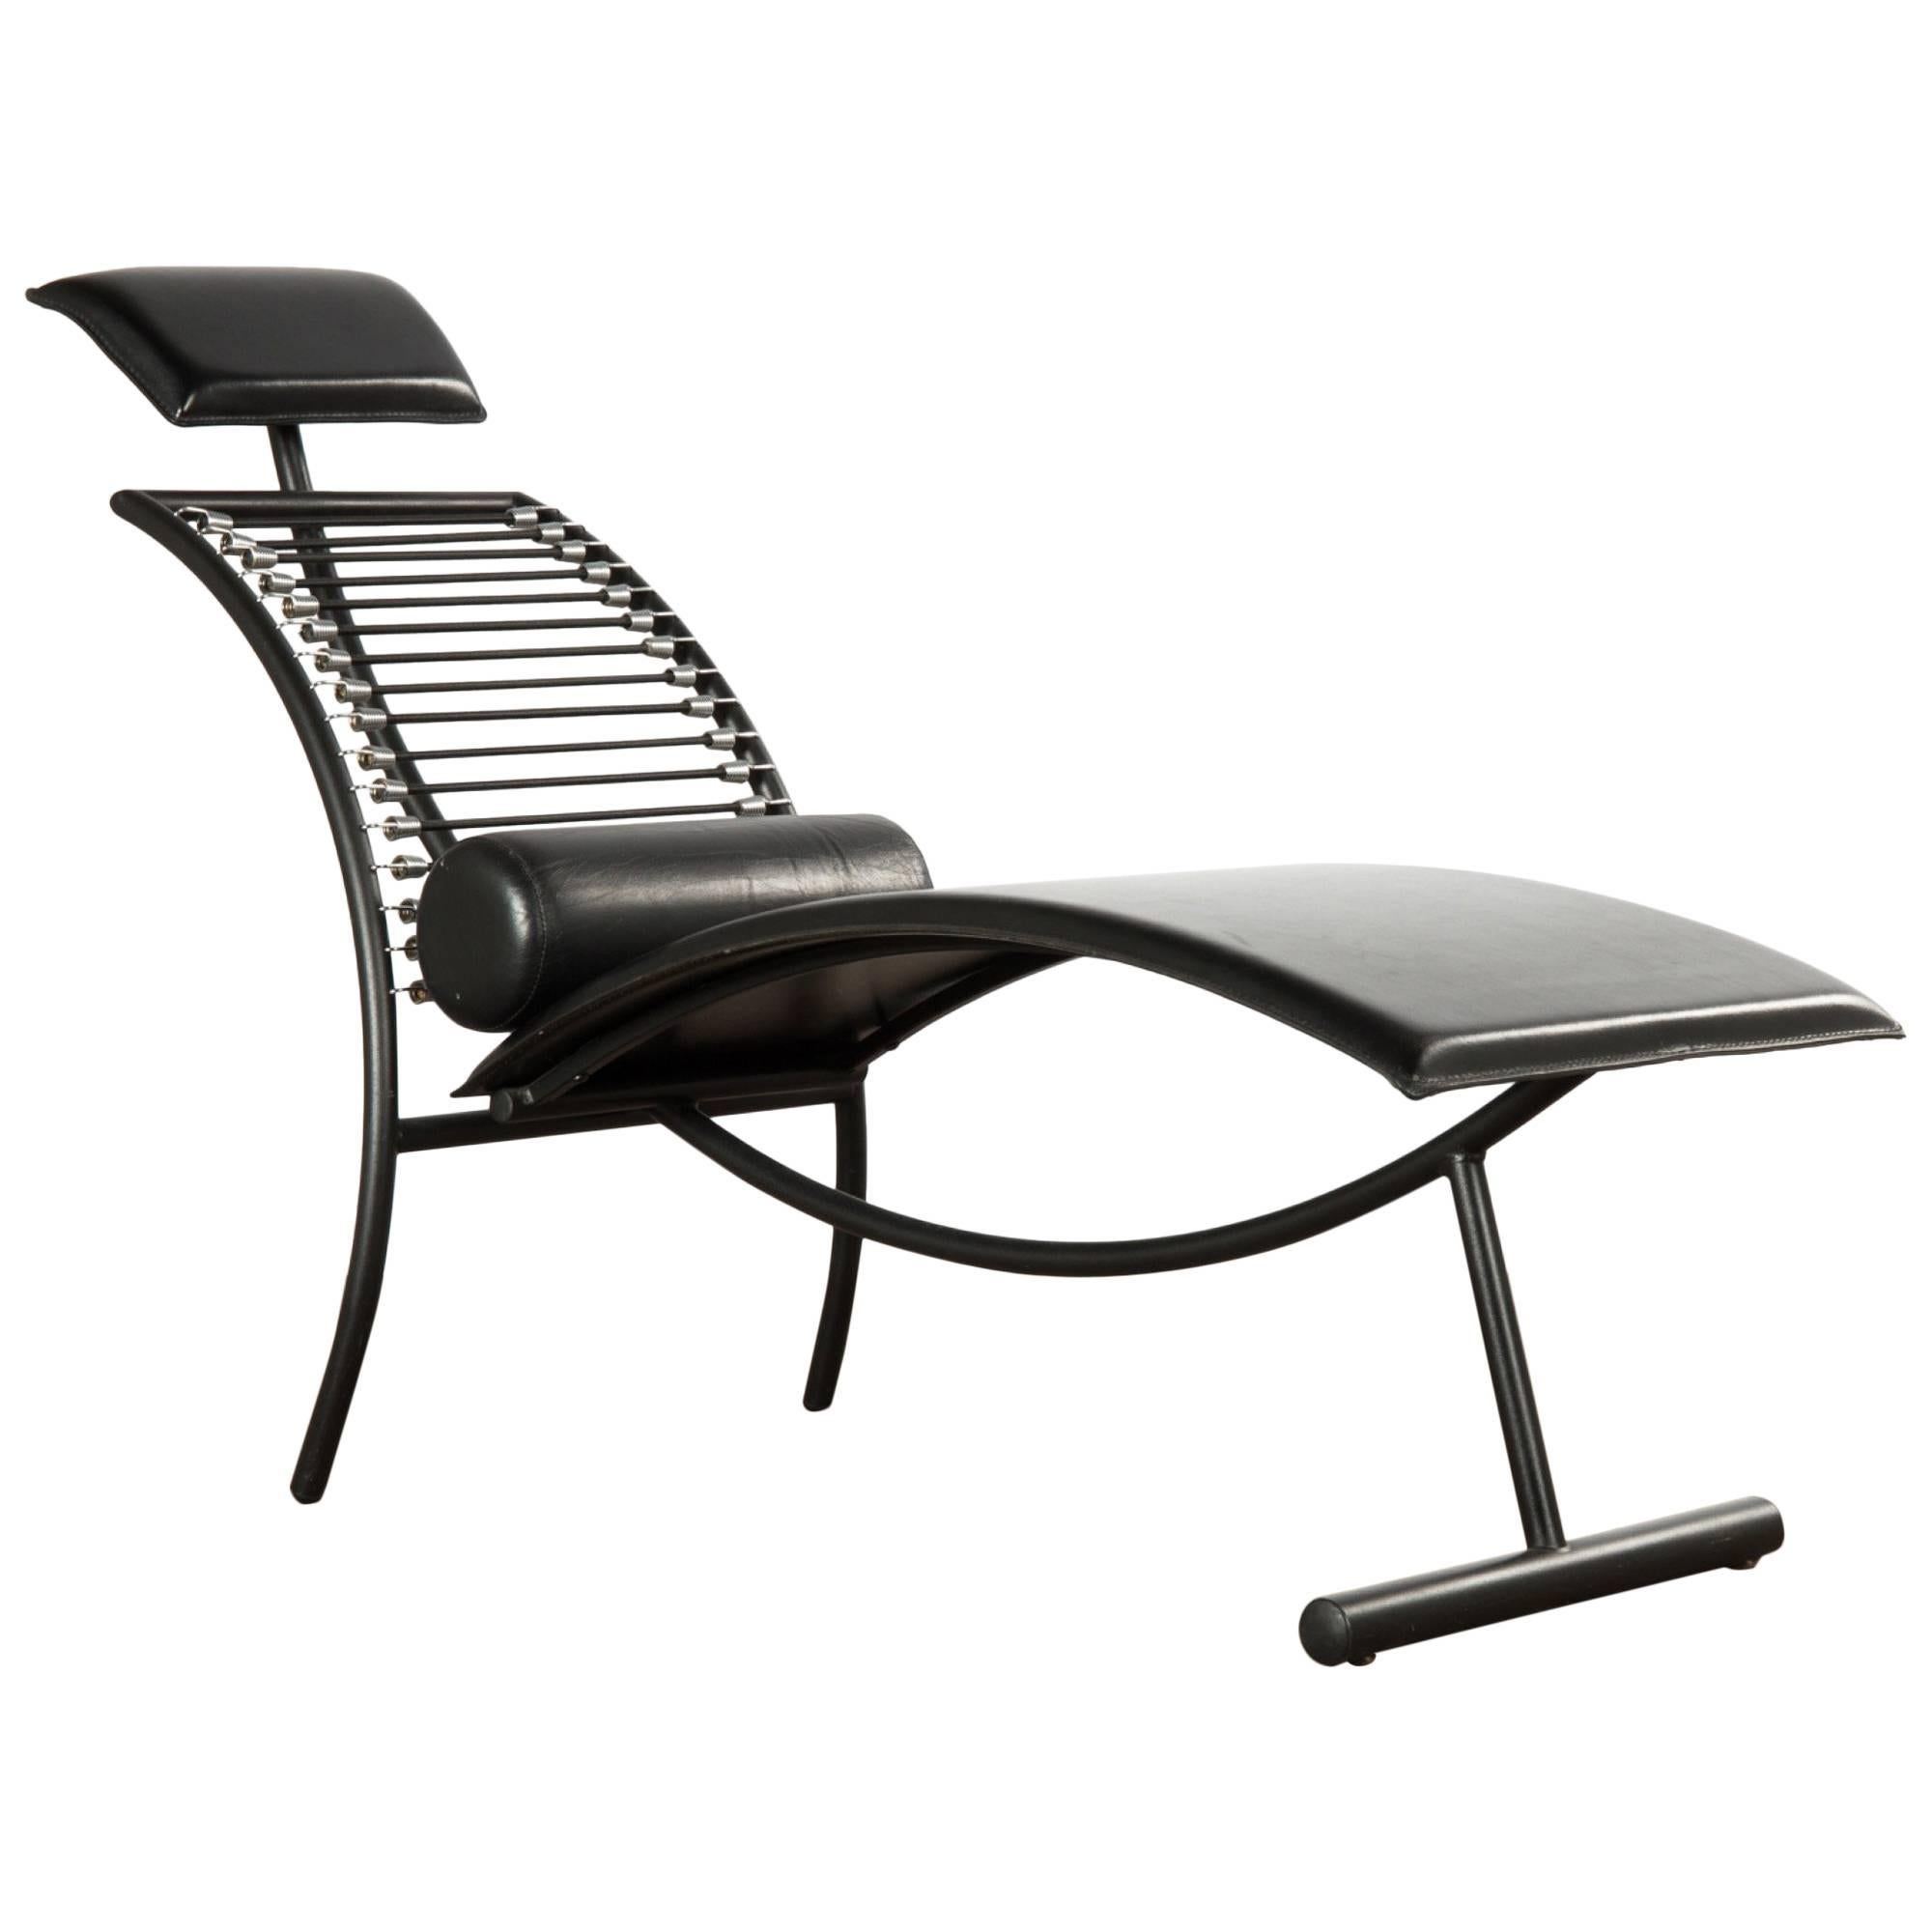 Postmodern Italian Chaise Lounge Chair, 1980s